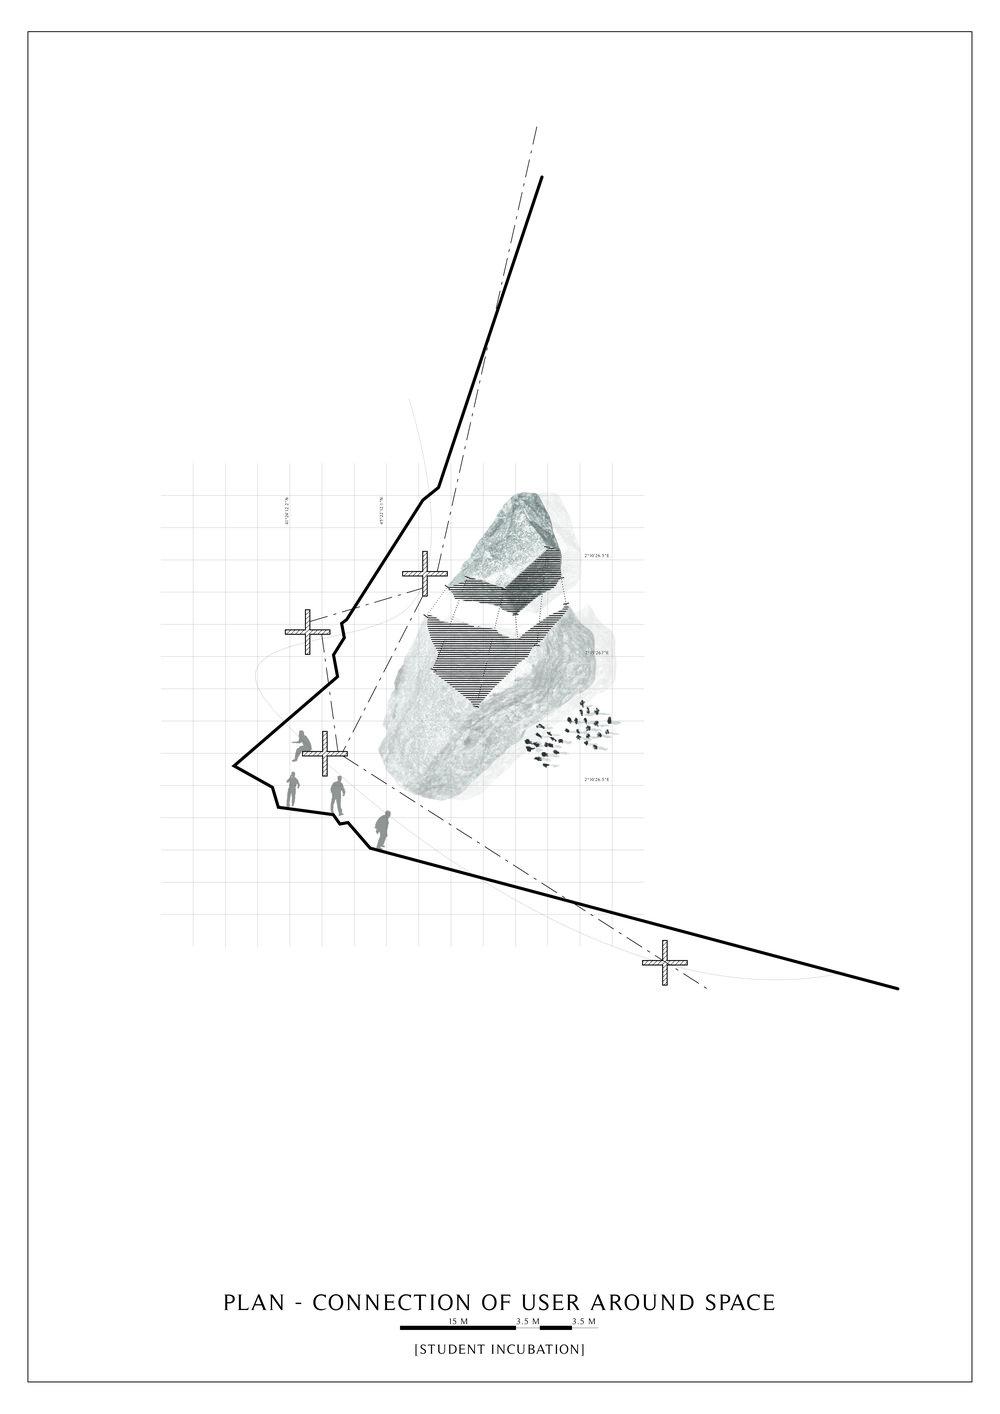 008c-fracture-series.jpg